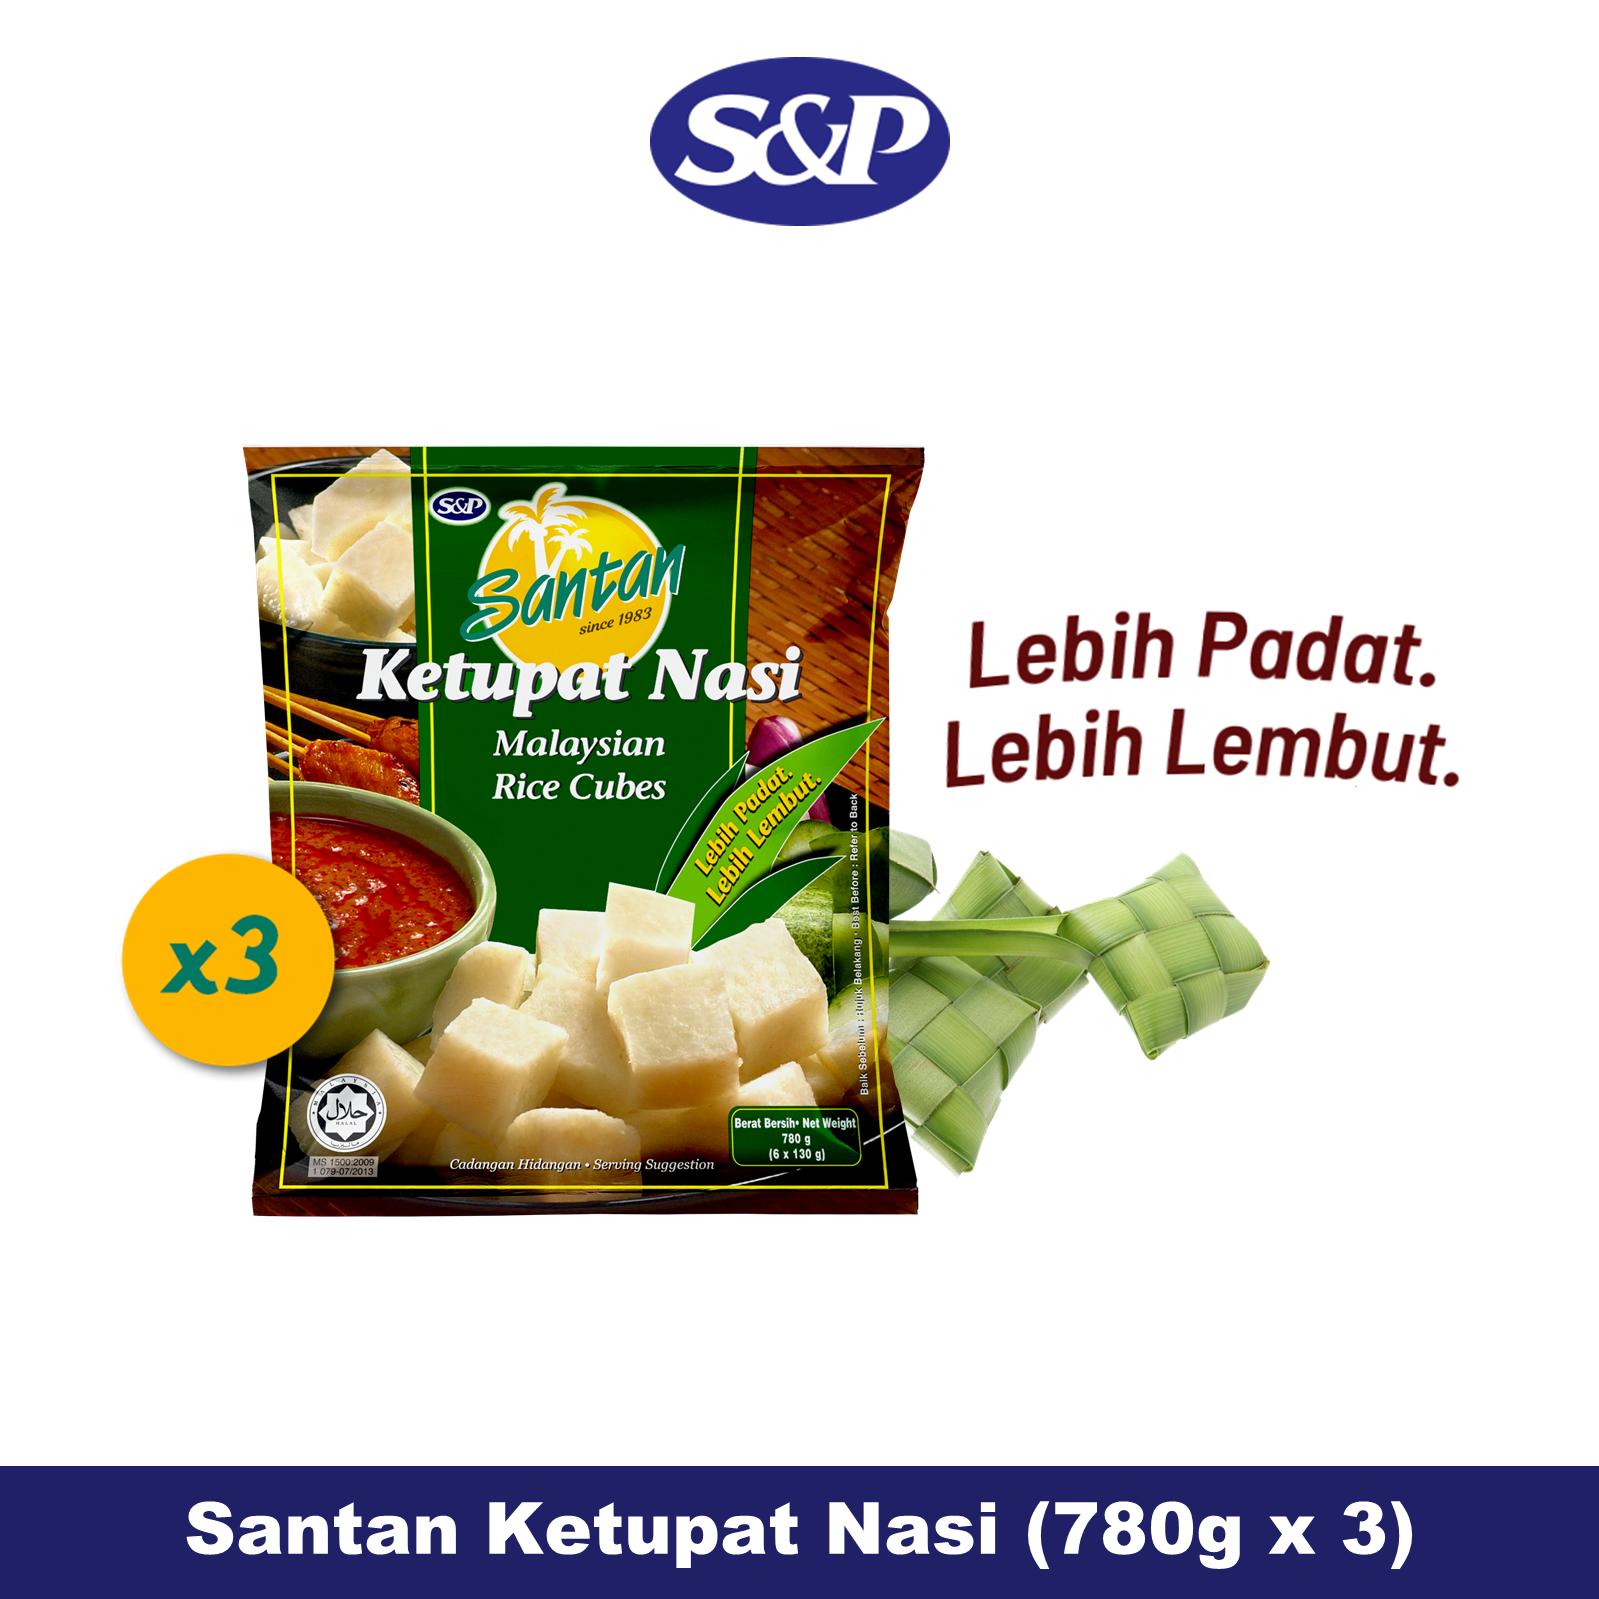 S&P Santan Rice Dumpling Ketupat Nasi (780g x3)